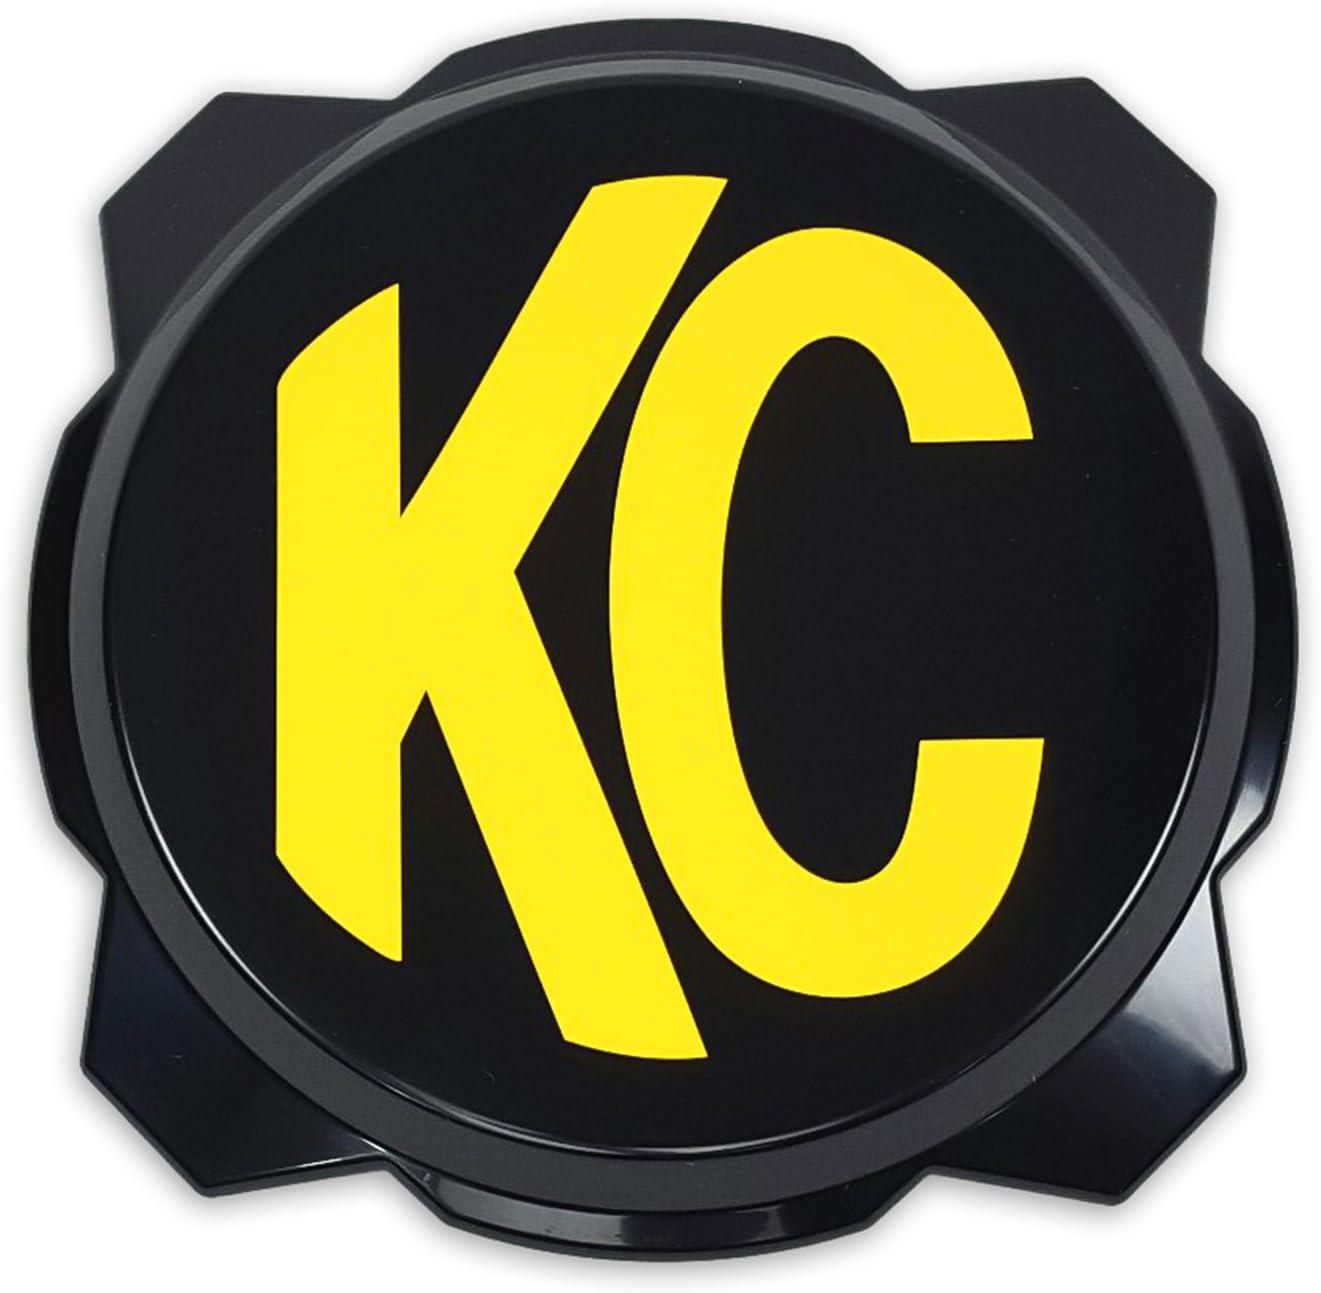 KC HiLiTES 5112 KC 5112 Gravity LED Pro6 Amber Light Cover provides added protec